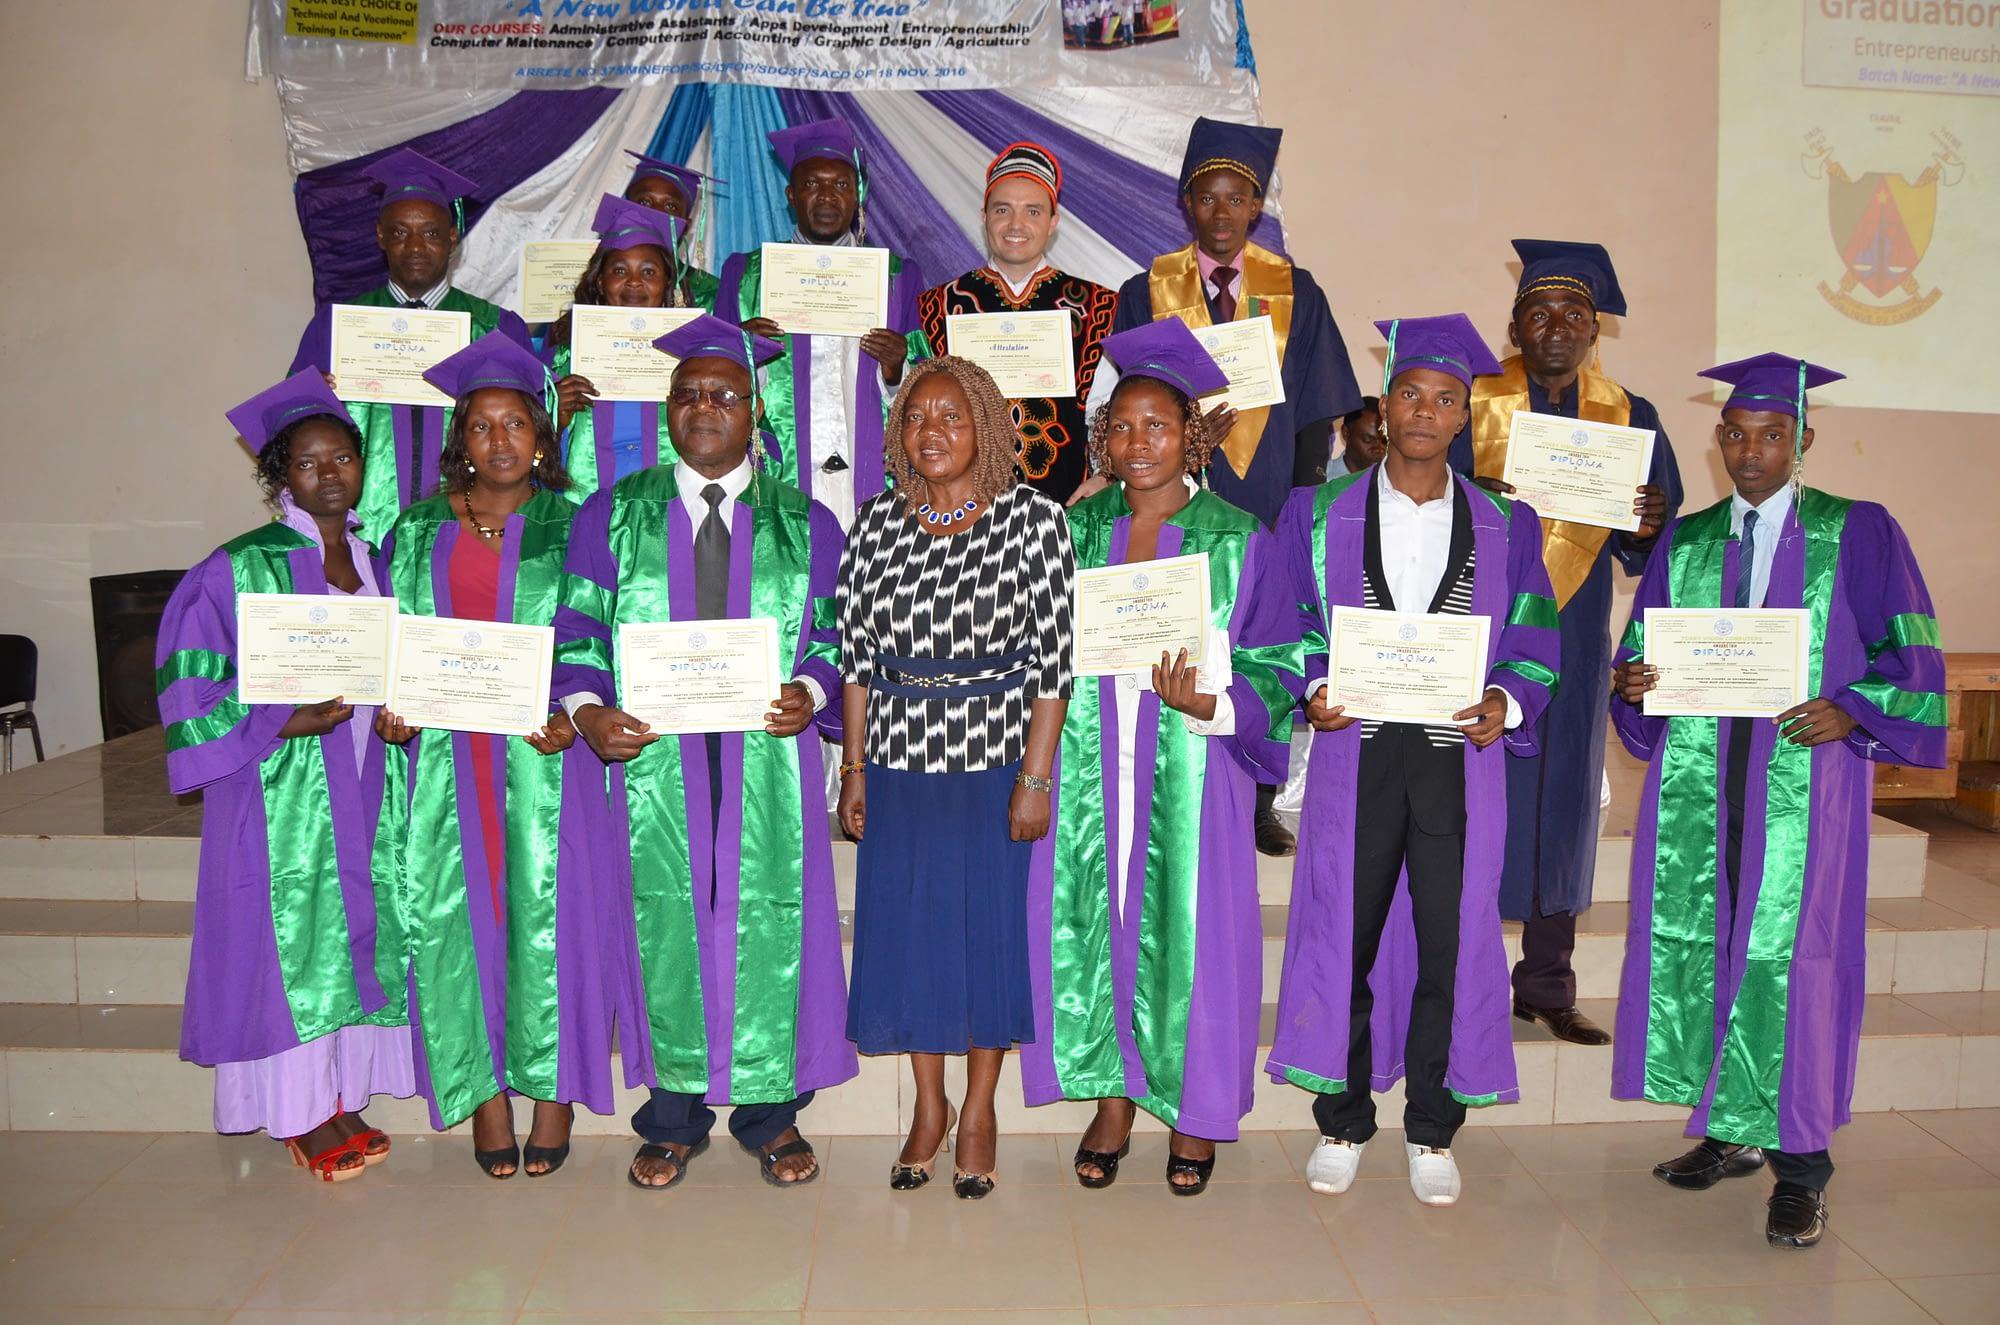 The proud graduates of the Tobby Vision Entrepreneurship Course.